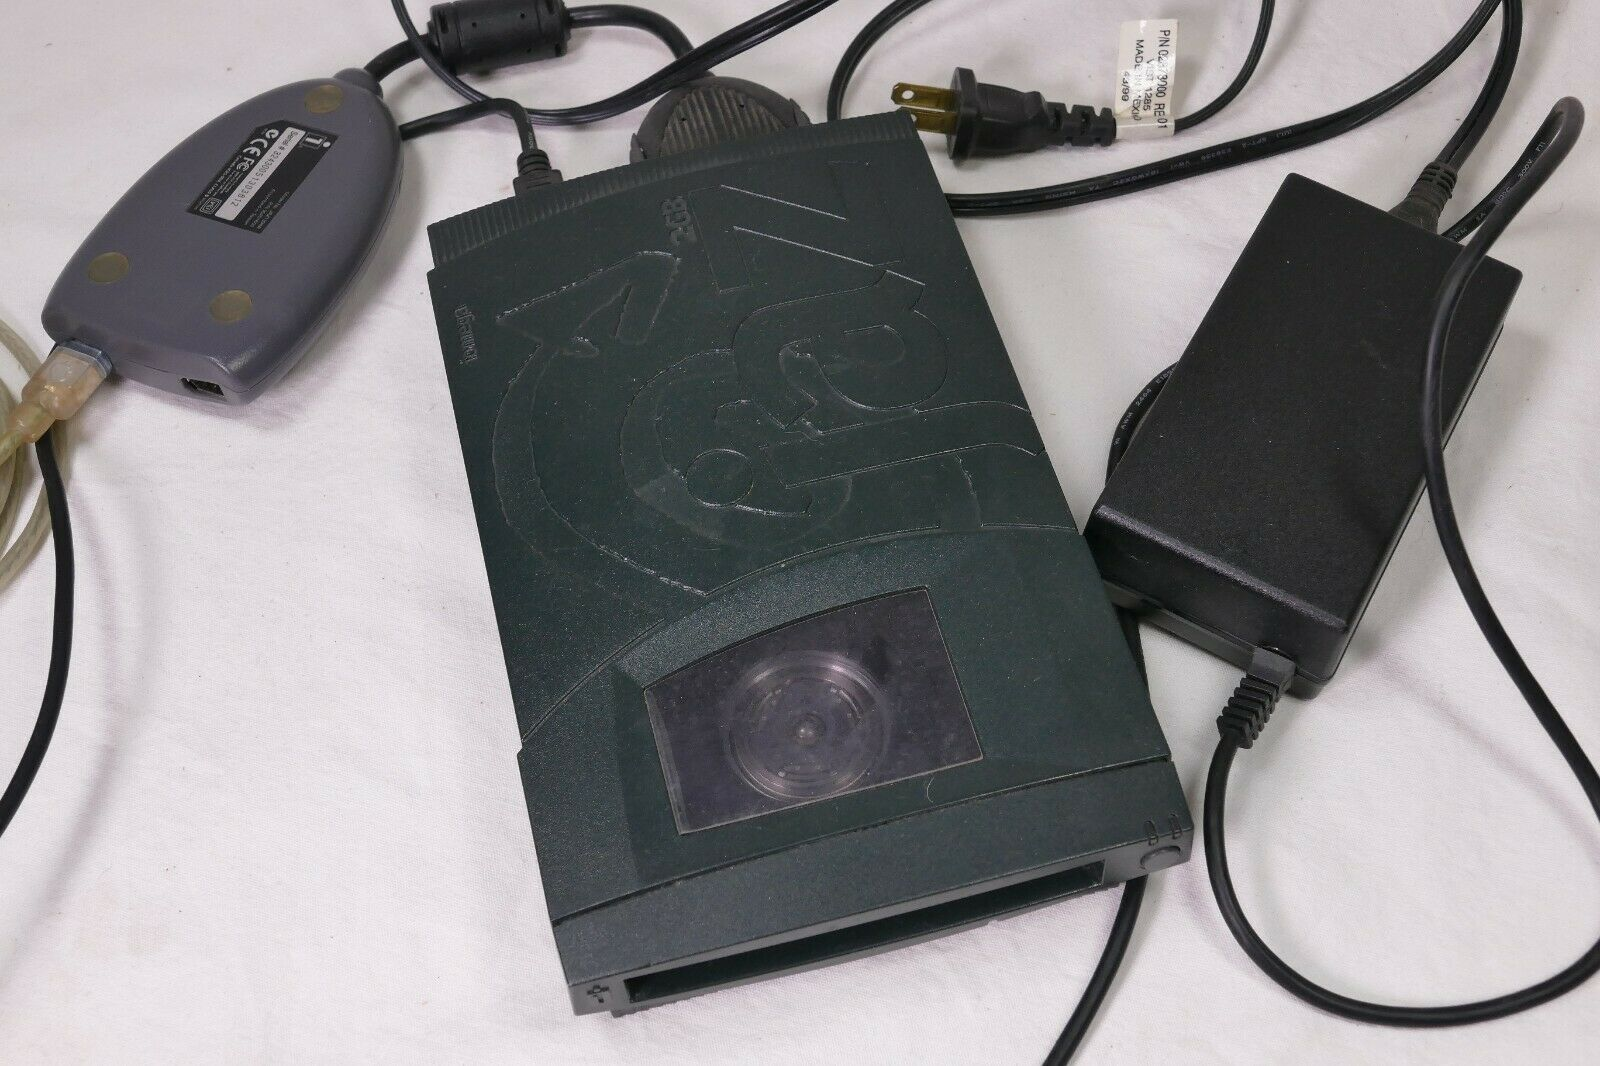 Iomega Jaz V2000S AND 1394A Jaz FireWire to SCSI Adapter for PC/Mac w/power